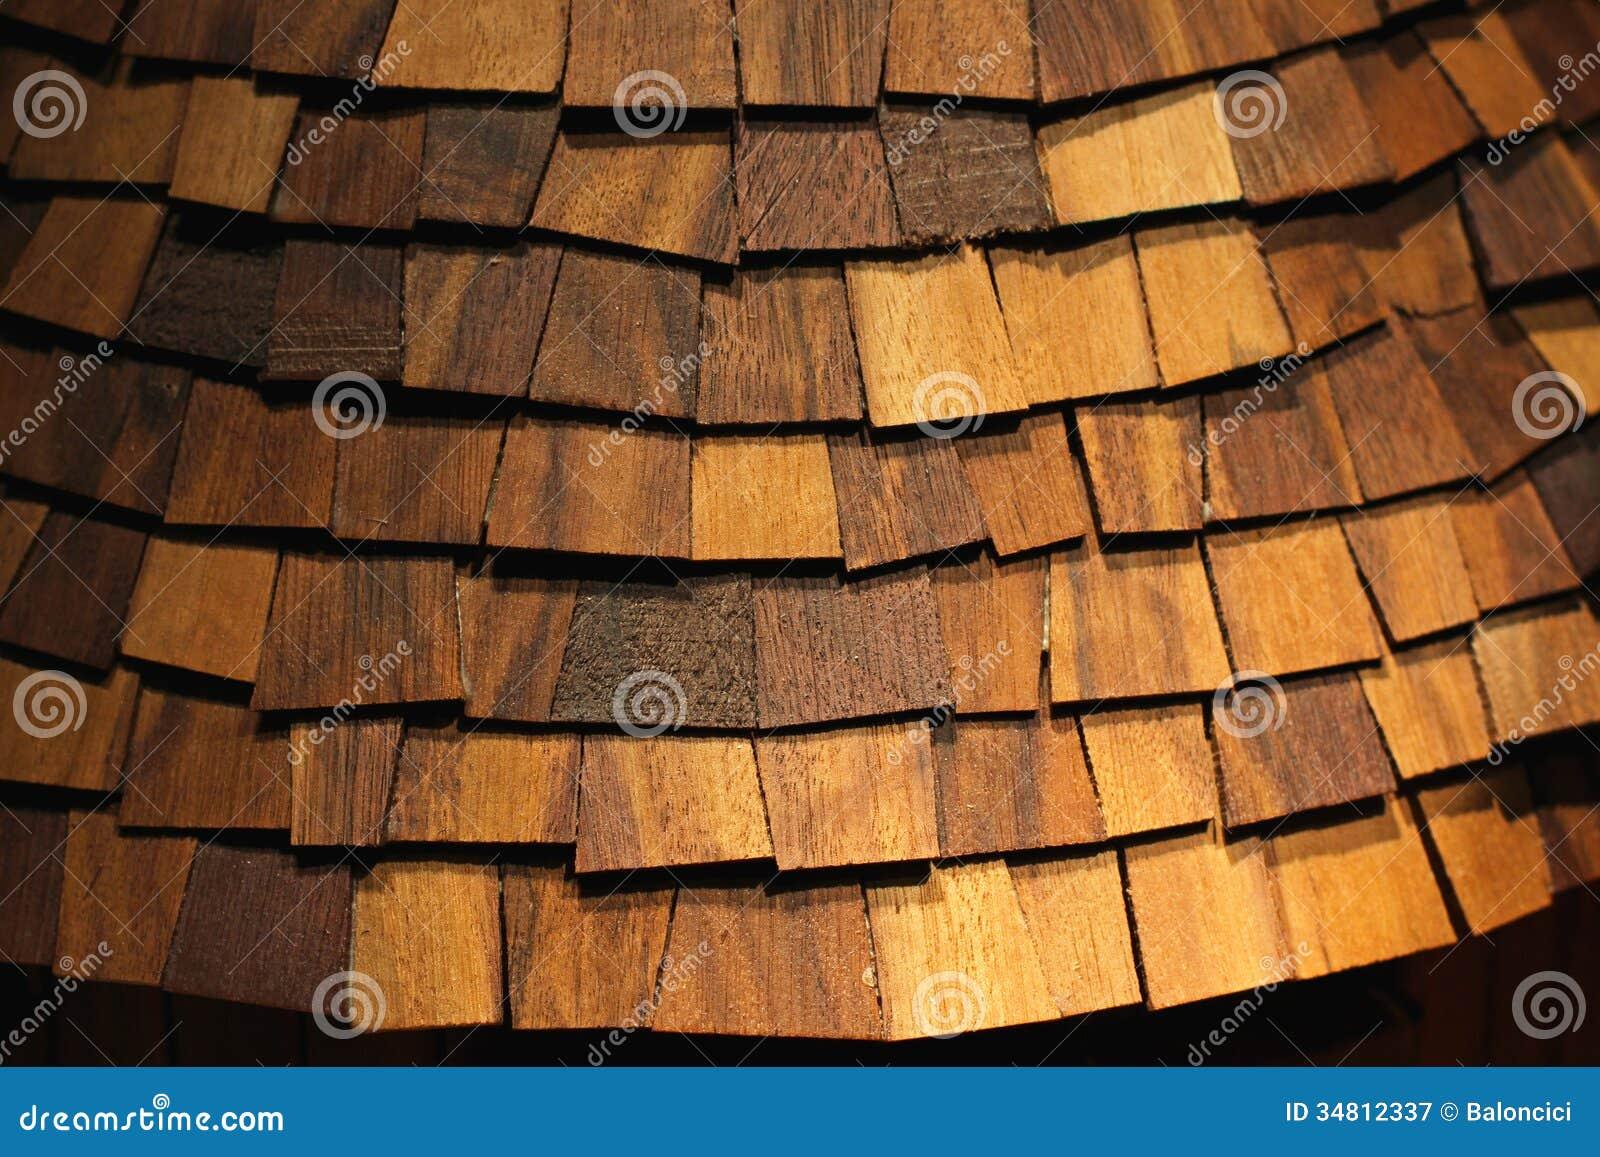 Wood Shingle Stock Image Image Of Pattern Wood Cover